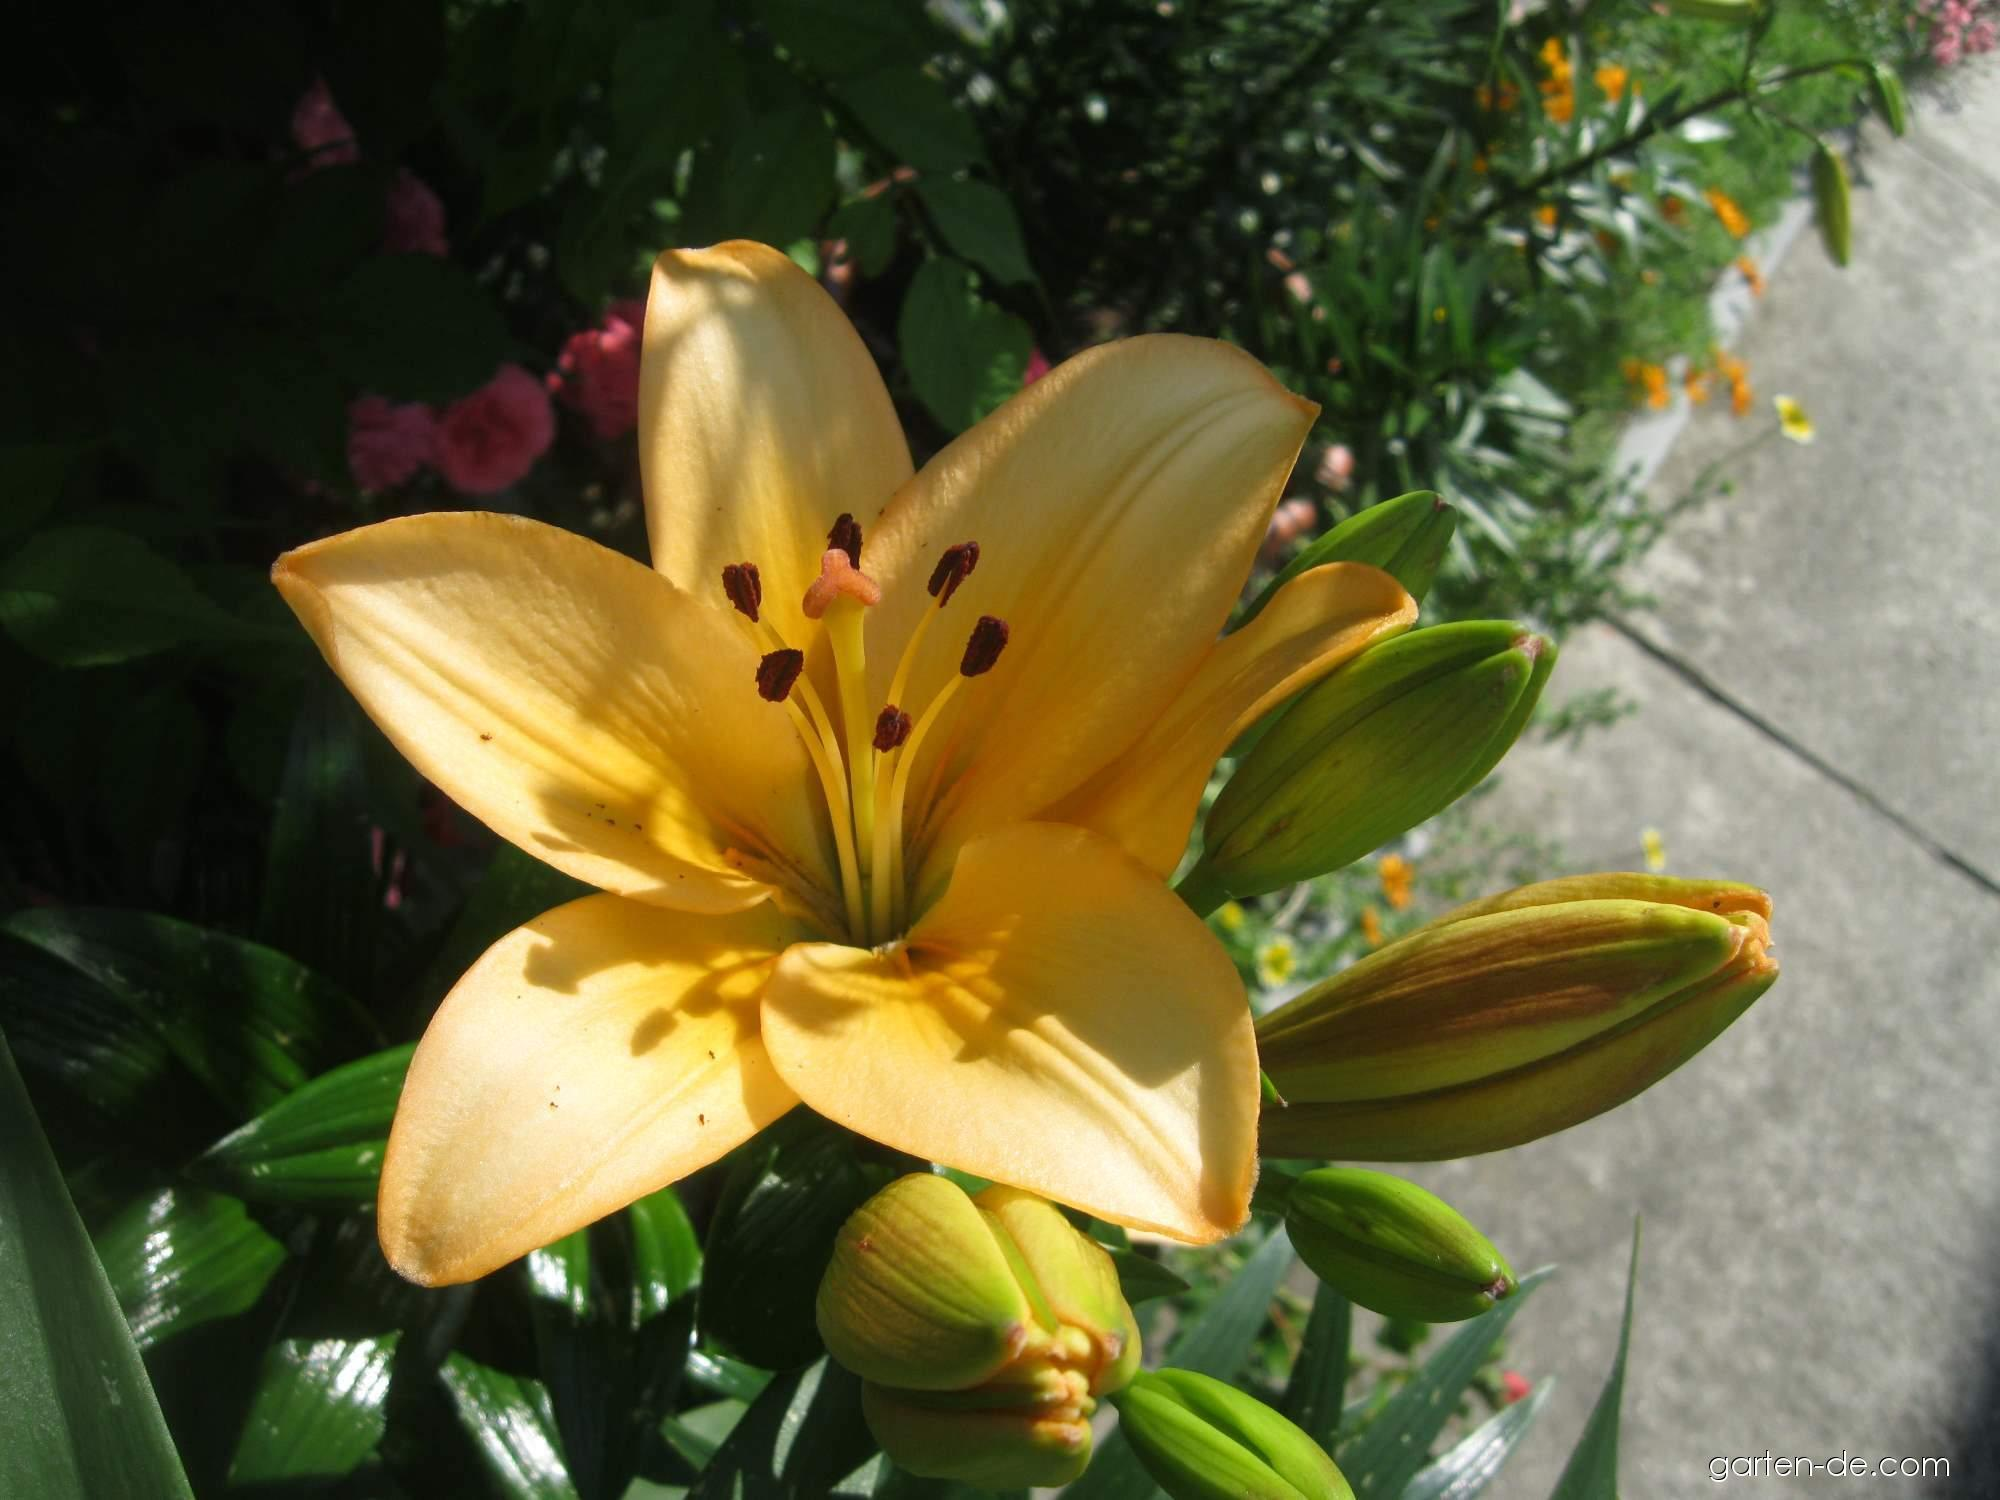 Lilie - Lilium x hybridum Menorca